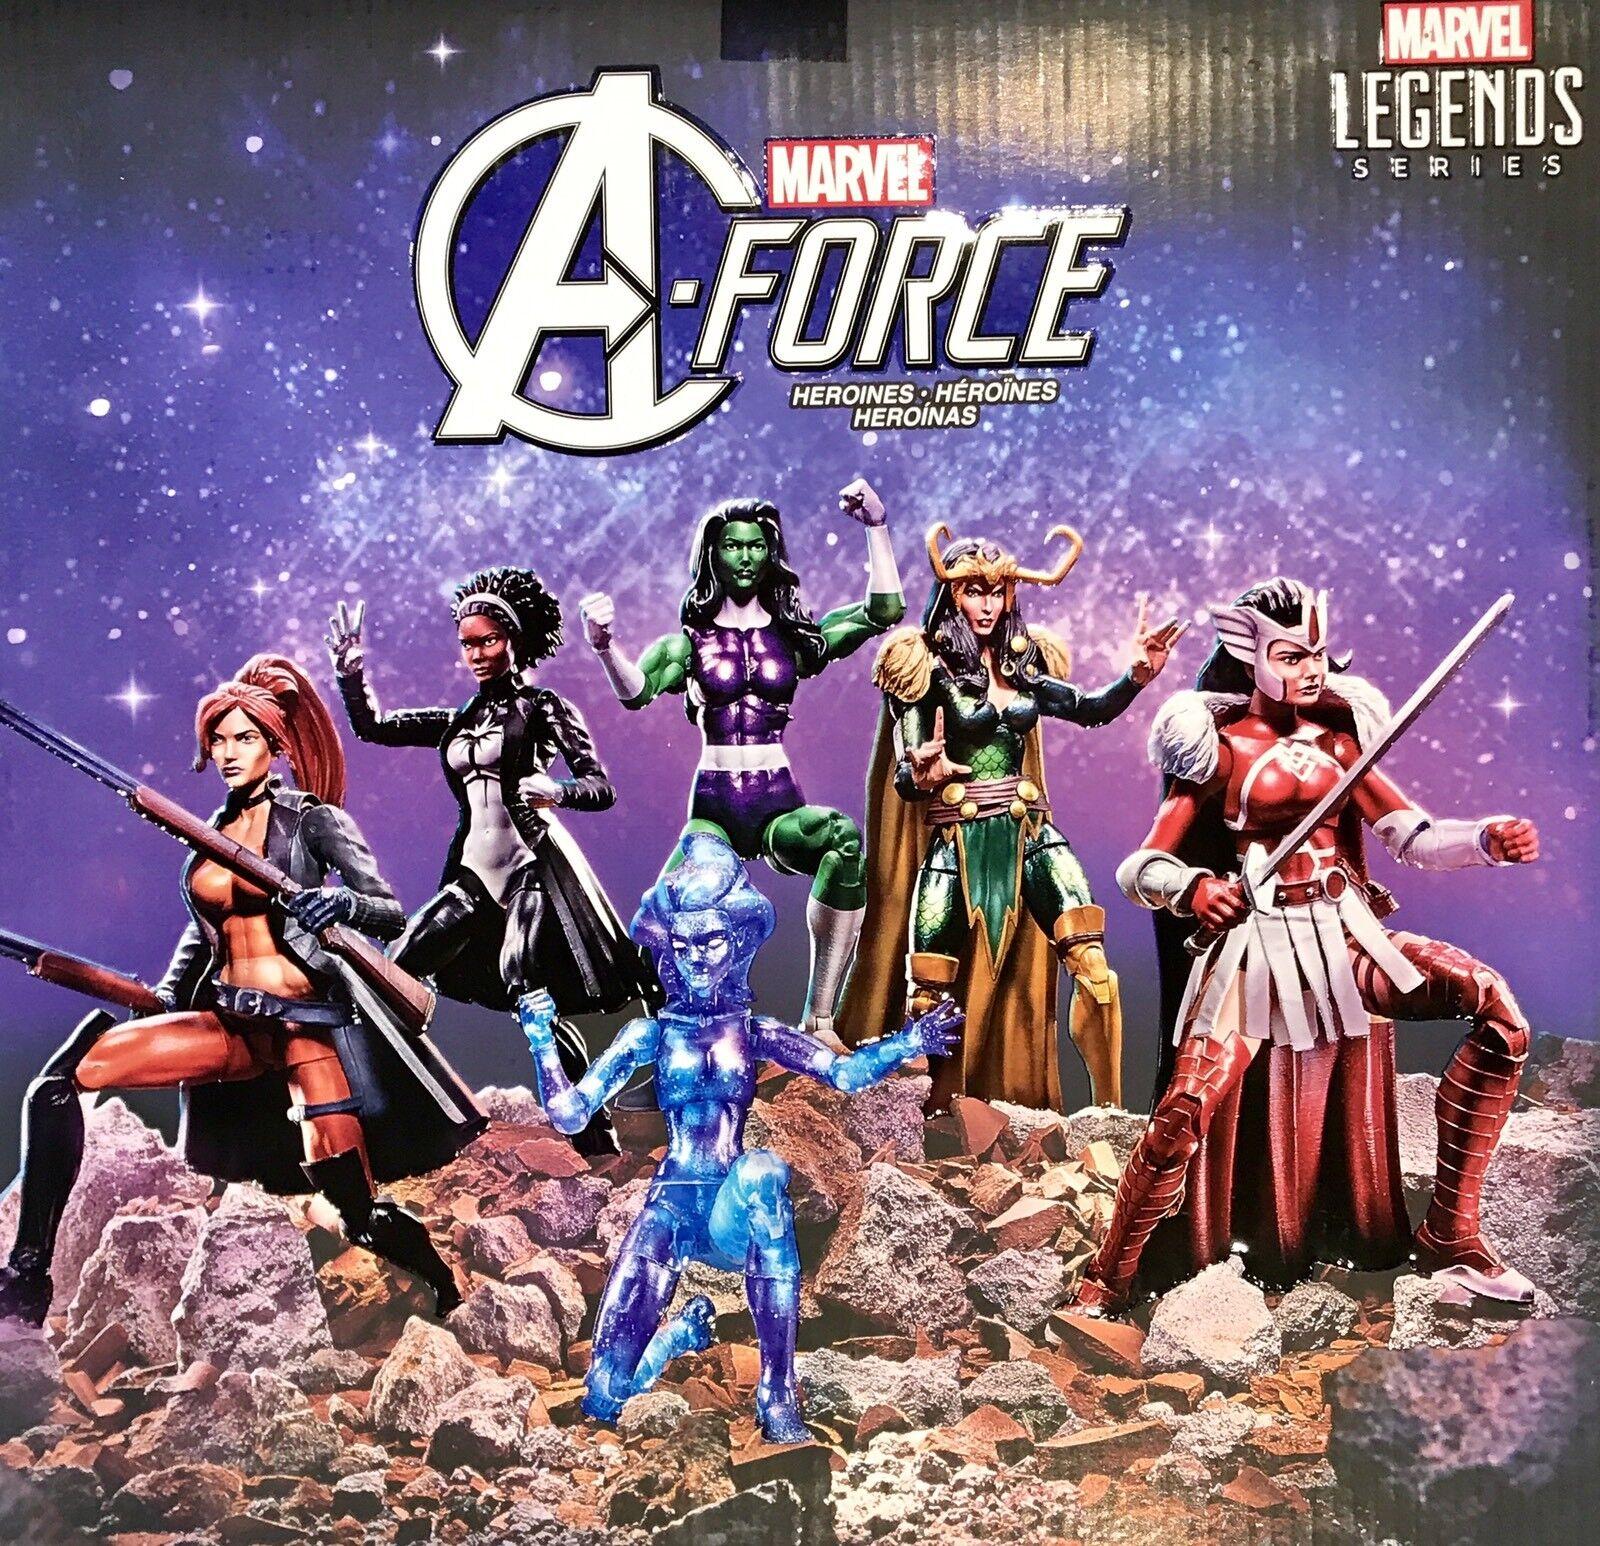 Neue marvel - legenden a-force sie hulk, loki, lady sif - sdcc tru - exklusiv -